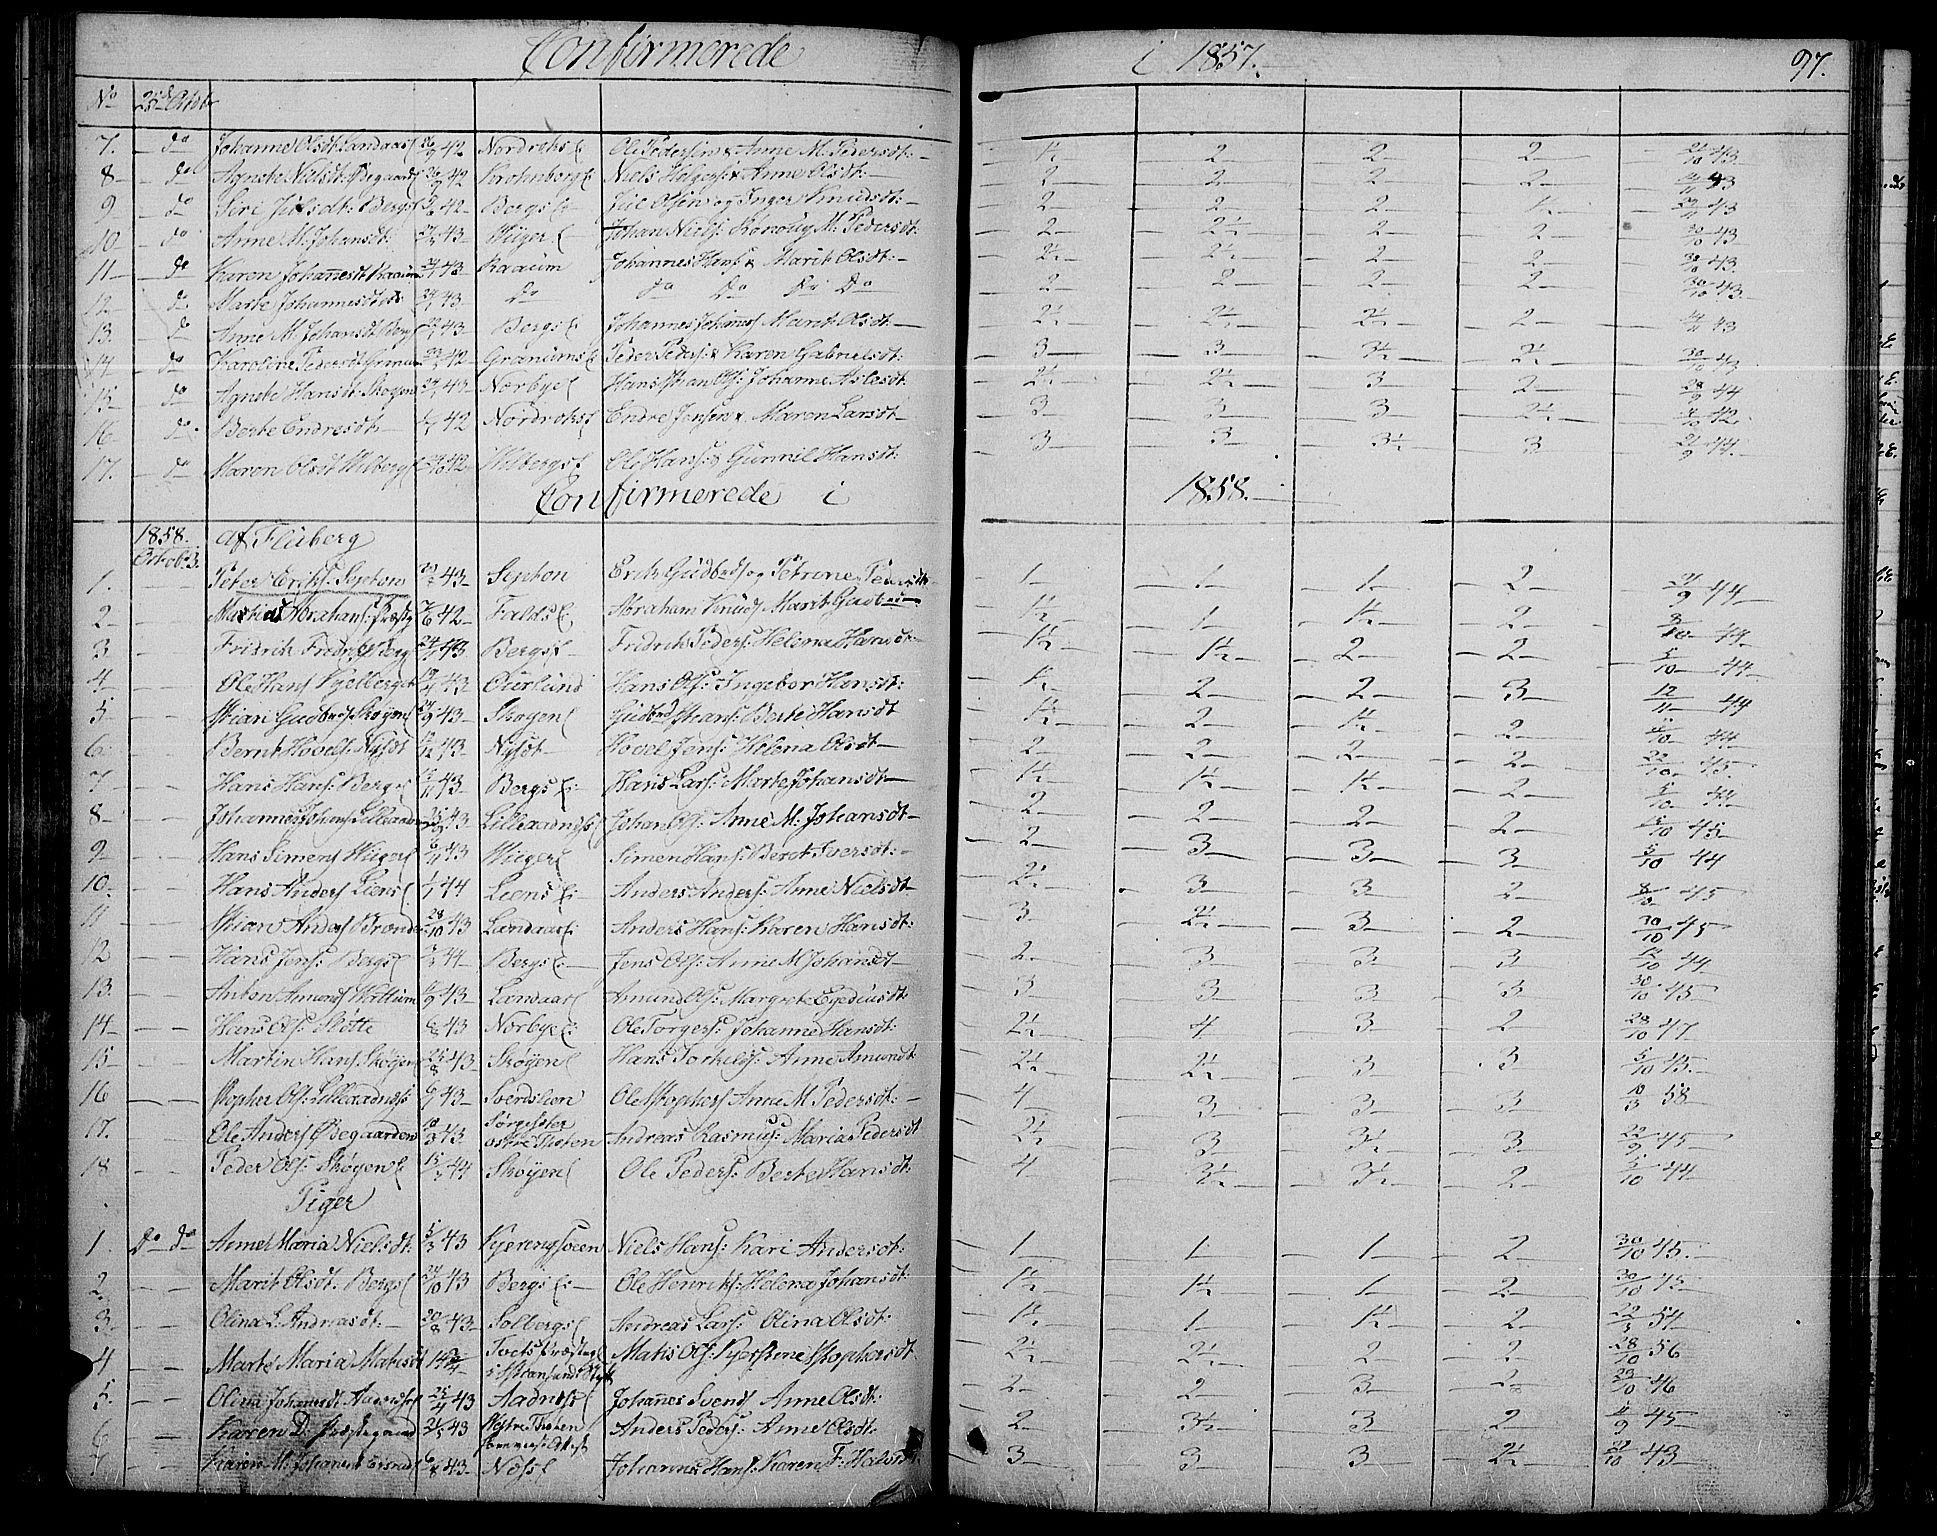 SAH, Søndre Land prestekontor, L/L0001: Klokkerbok nr. 1, 1849-1883, s. 97